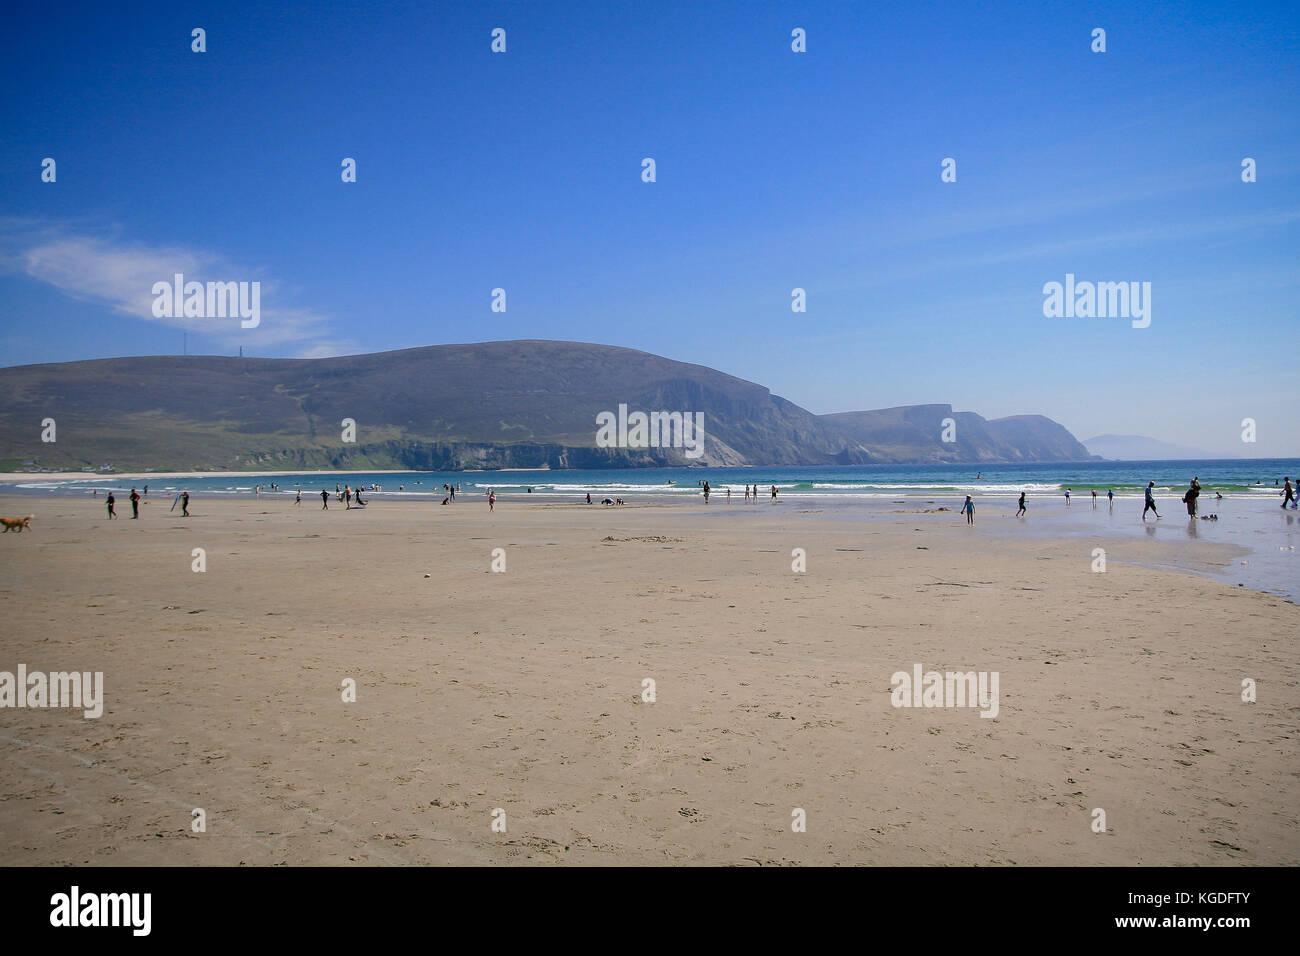 People enjoying good weather on a beautiful sandy Keel Beach in Achill Island, County Mayo, Ireland - Stock Image